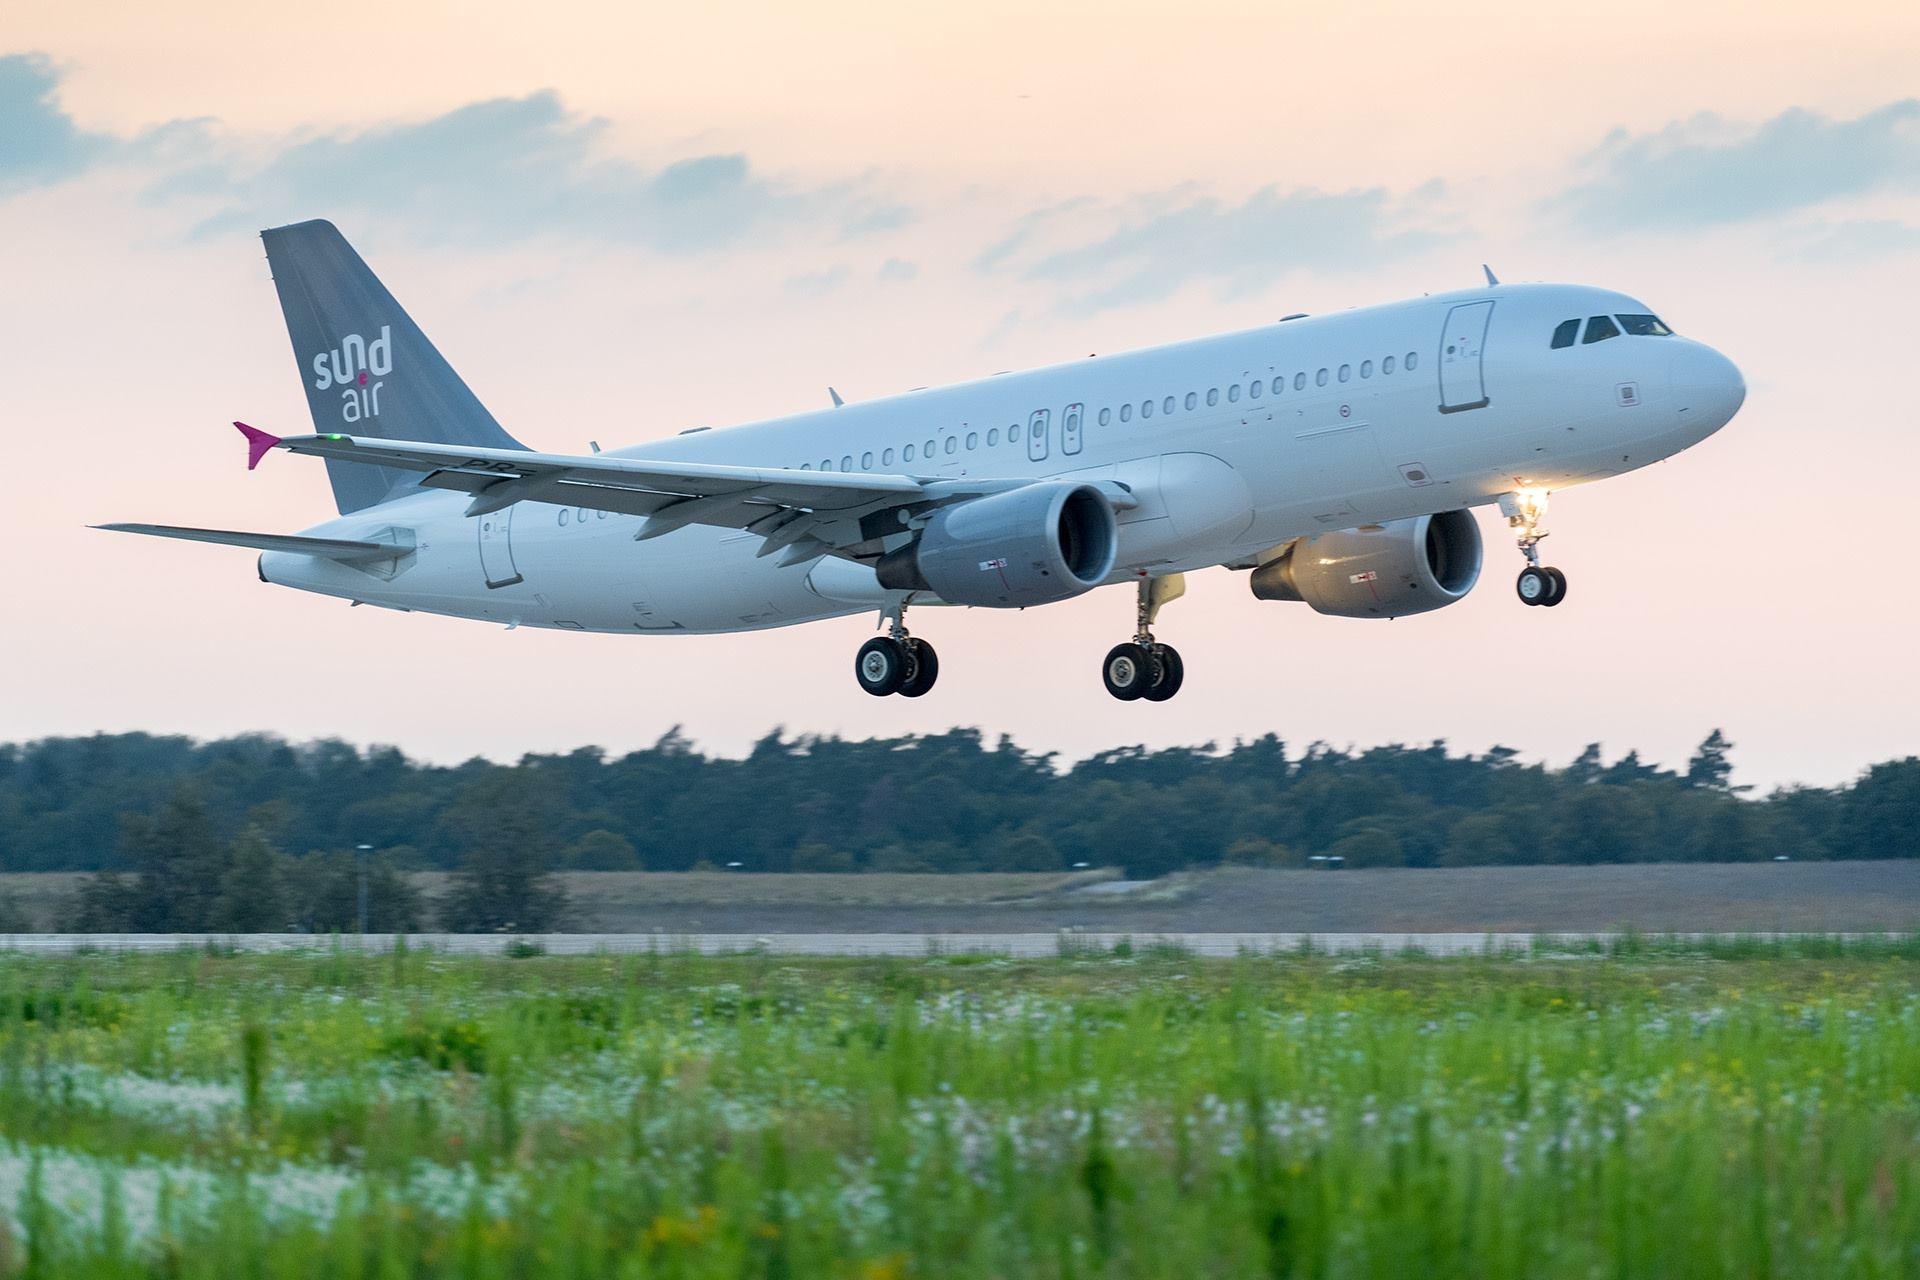 En Airbus A320-200 fra det tyske charterflyselskab Sundair. Foto: Sundair